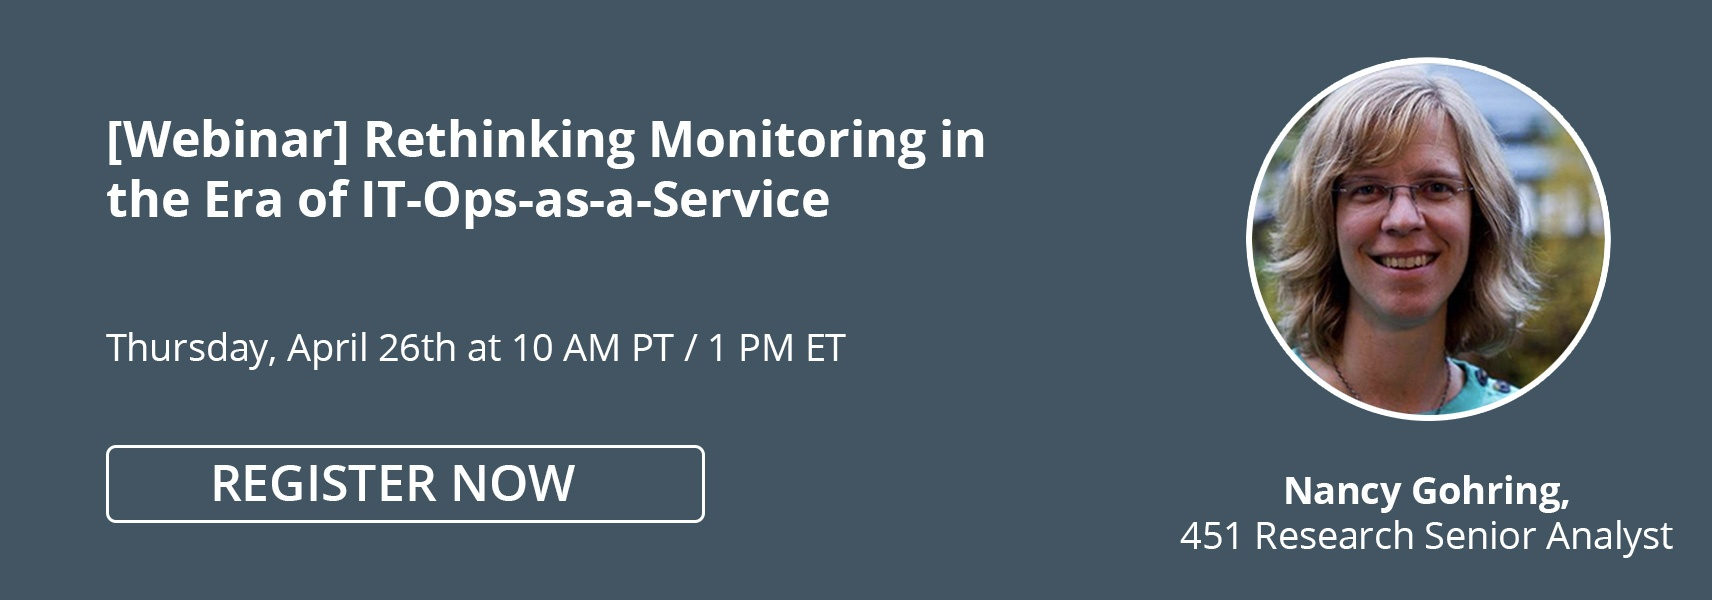 Webinar-Rethinking-Monitoring-CTA